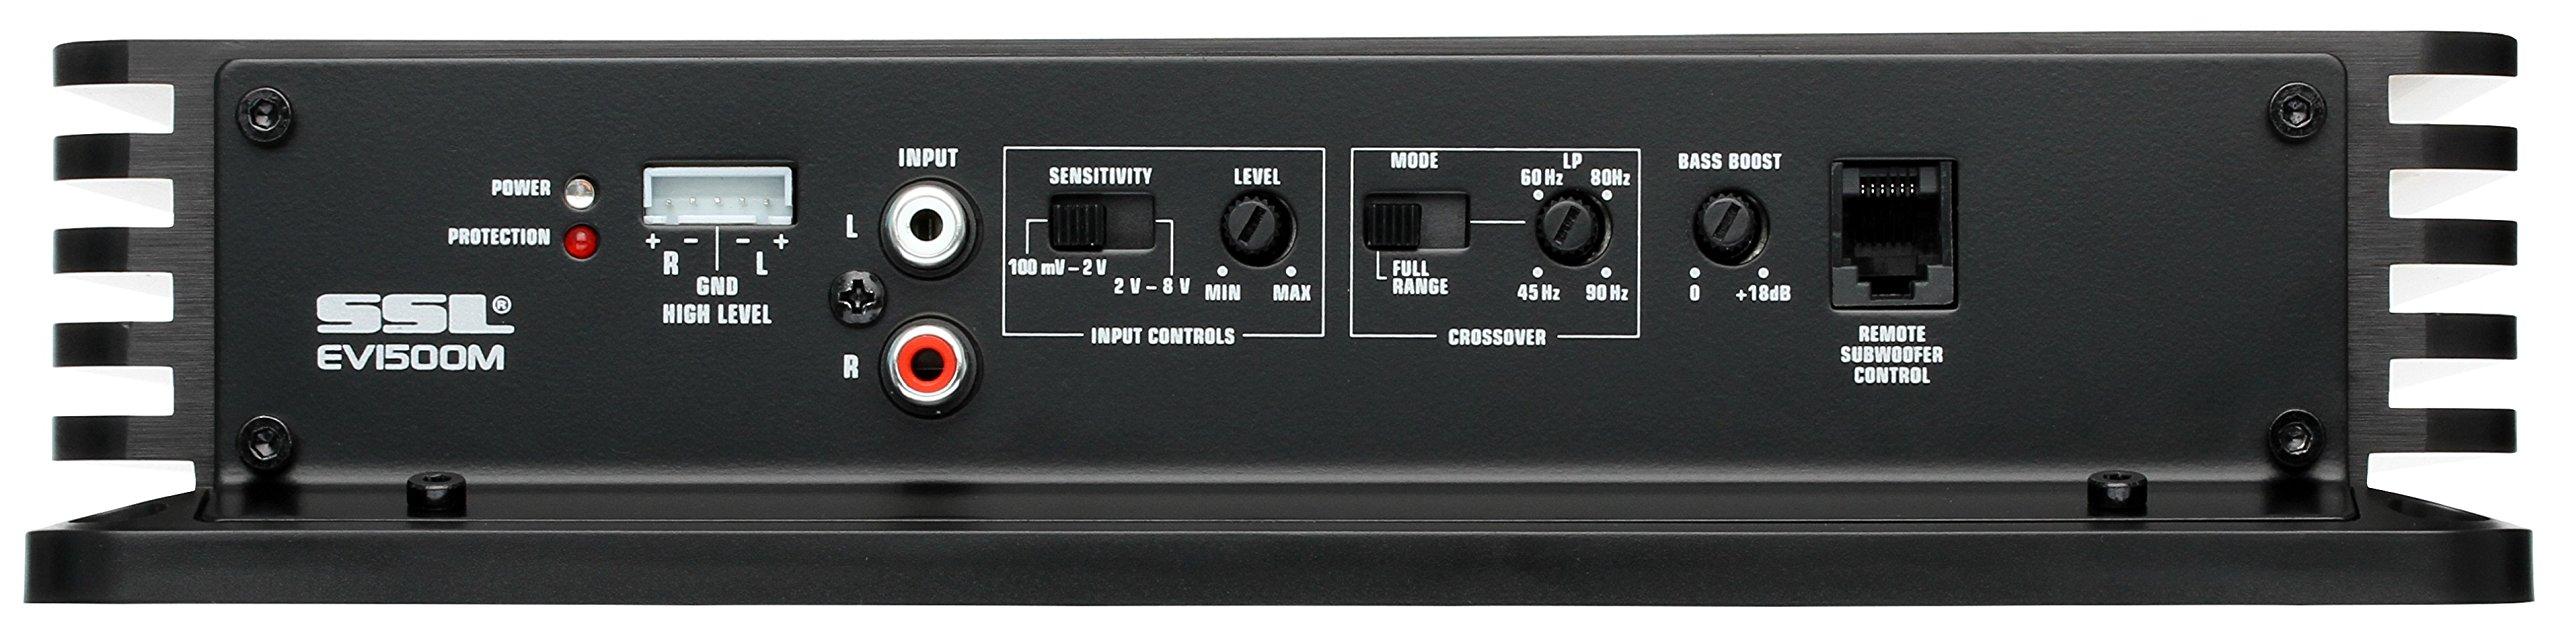 Sound Storm EV1500M Evolution 1500 Watt, 2 Ohm Stable Class A/B, Monoblock, MOSFET Car Amplifier with Remote Subwoofer Control by Sound Storm Laboratories (Image #3)